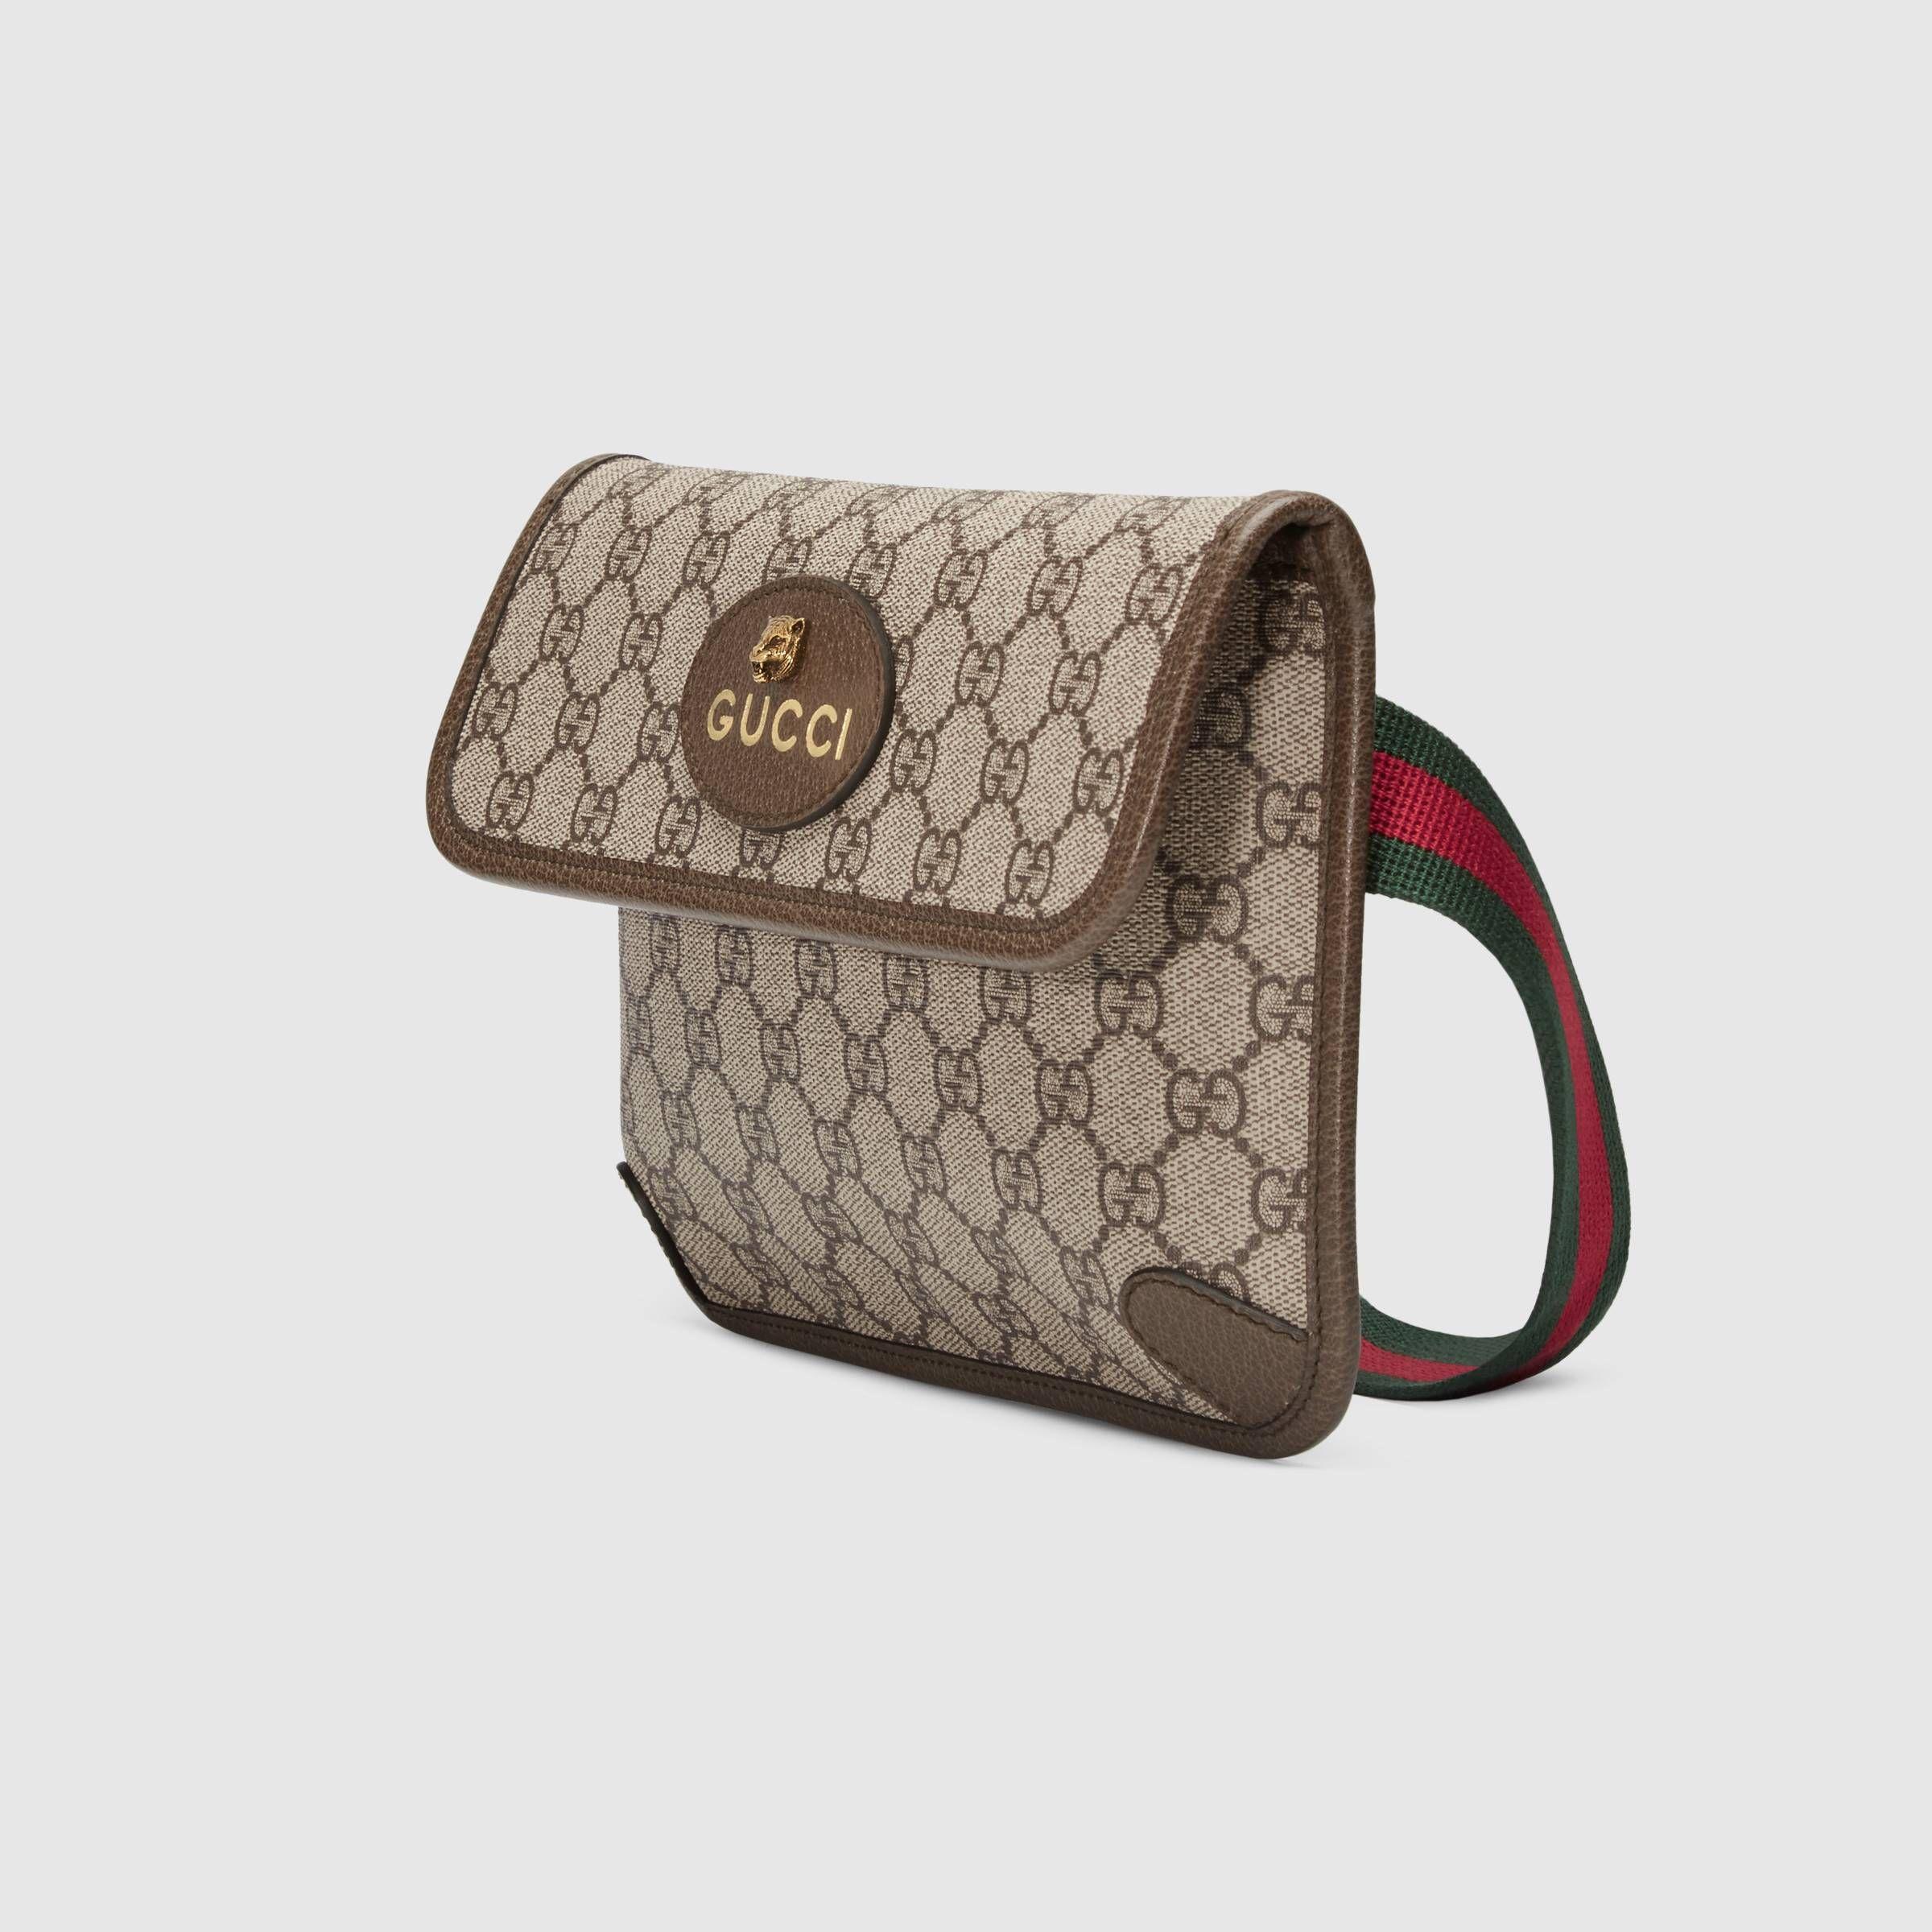 63c72c8300a Gucci GG Supreme belt bag Detail 2